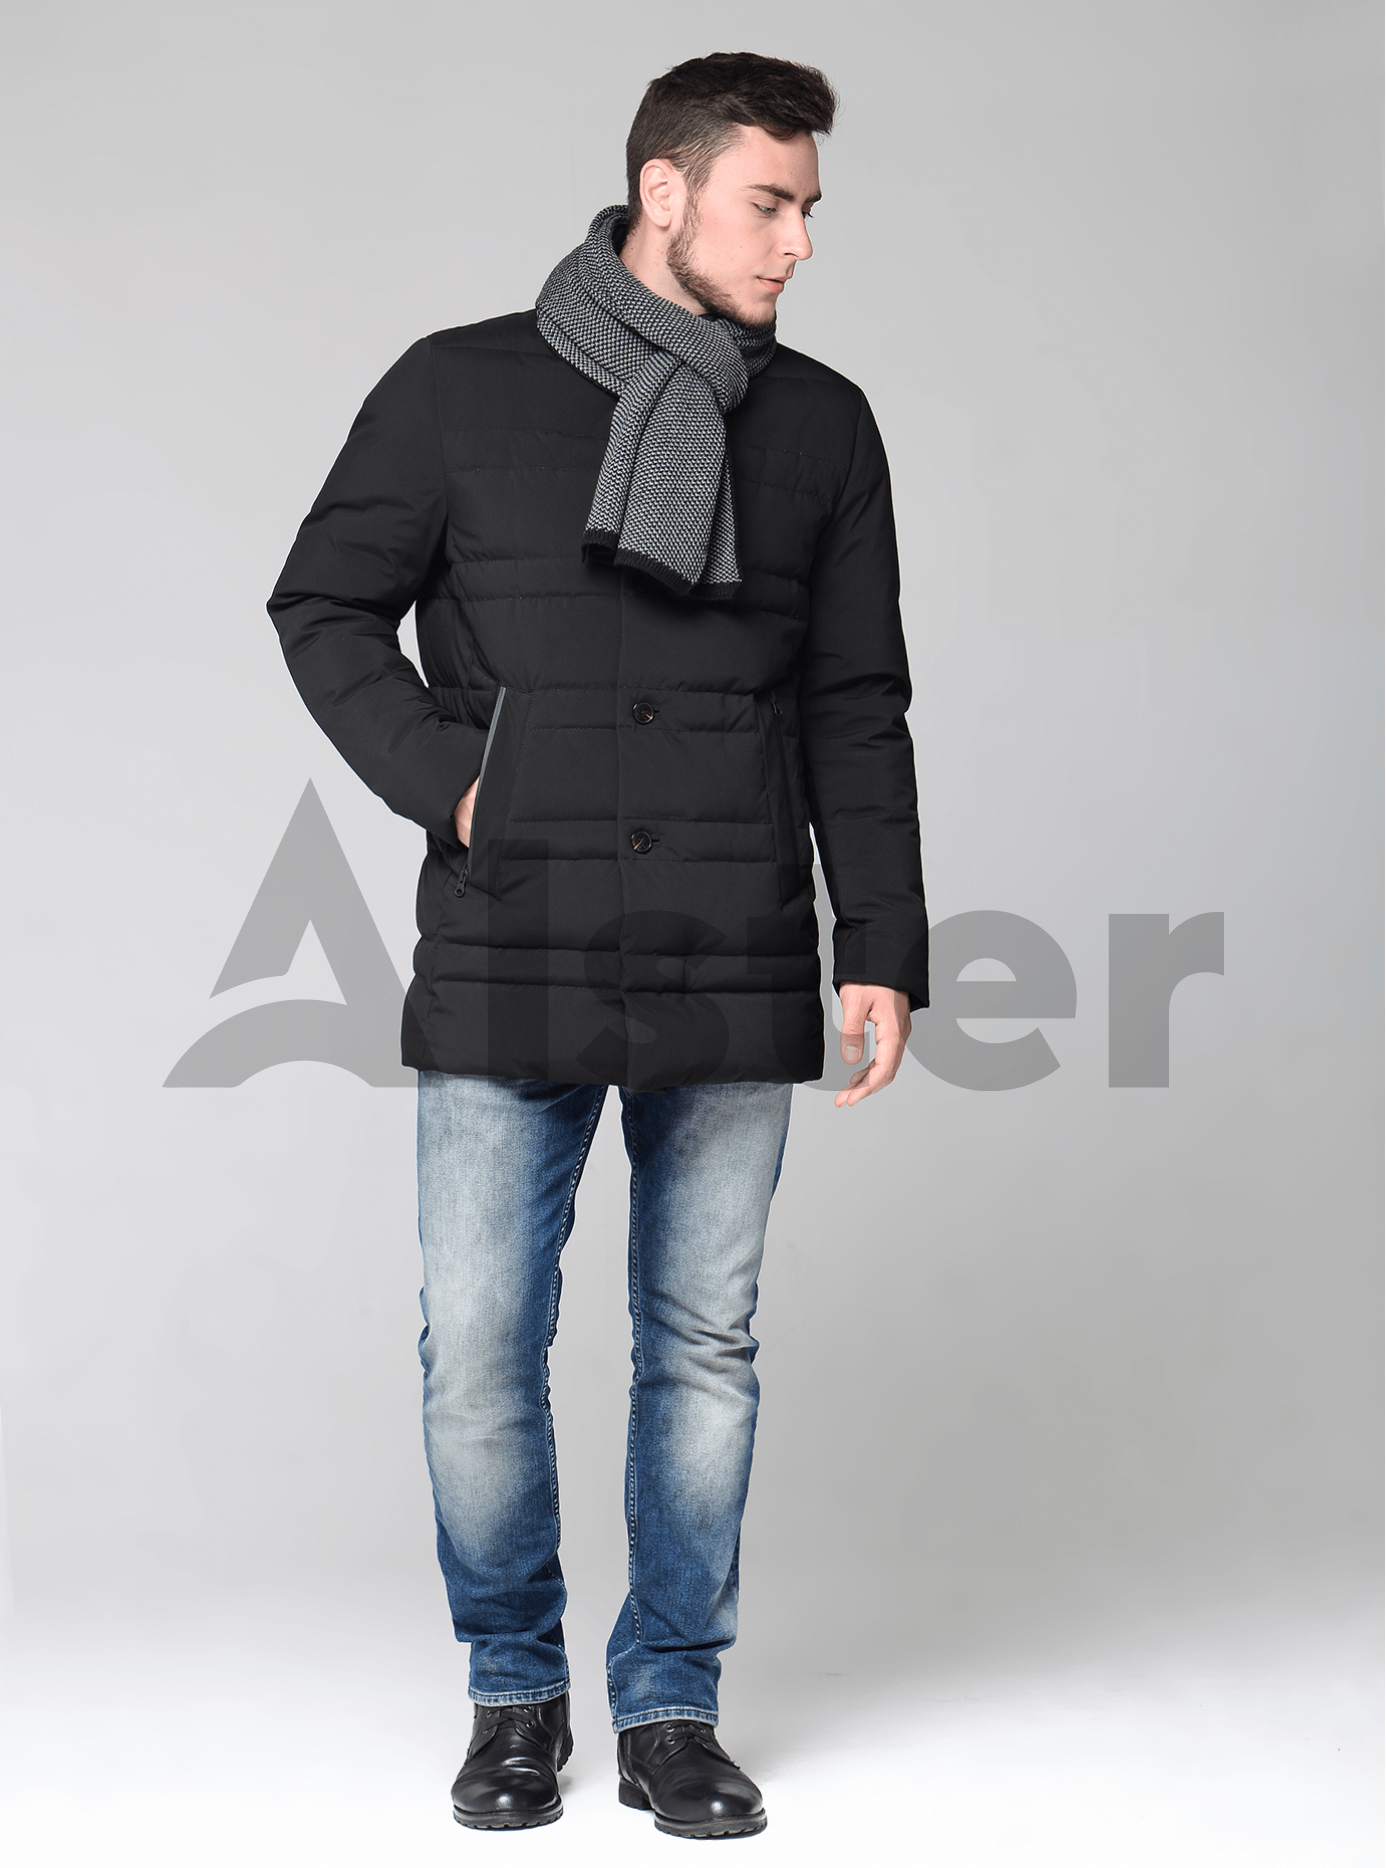 Зимний мужской пуховик Синий 46 (02-MC19039): фото - Alster.ua